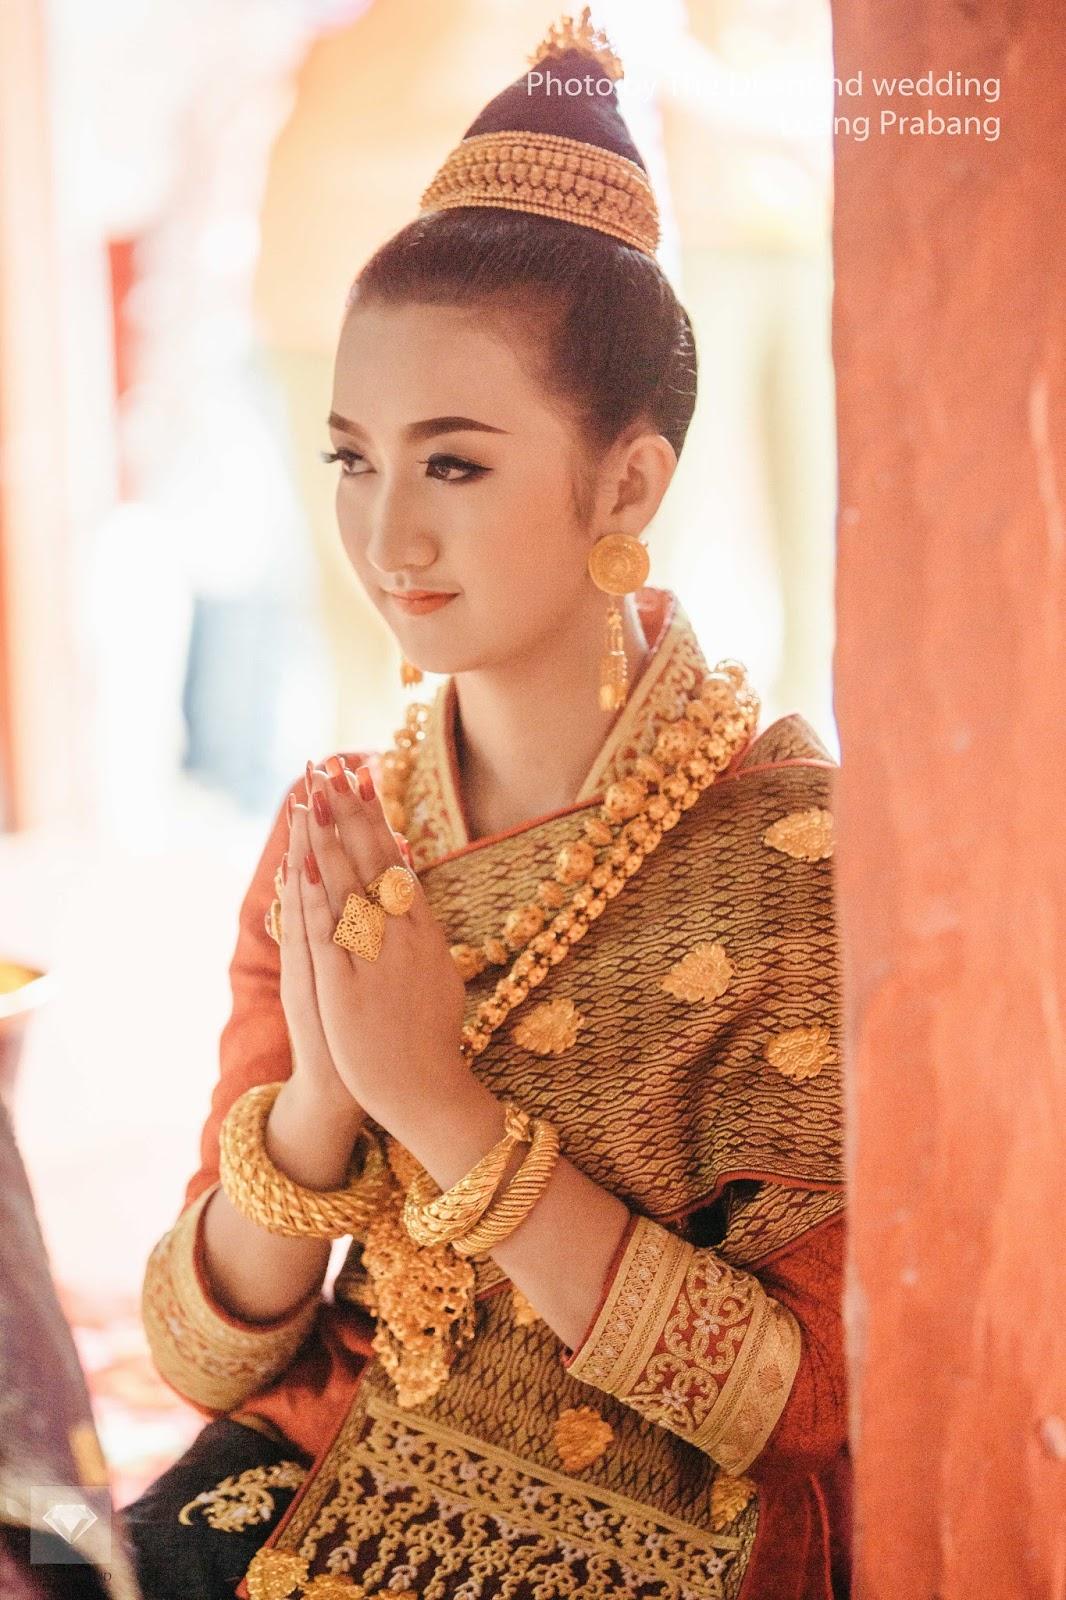 Lao new year photos in Luang Prabang 2017, part I | LAOS ...